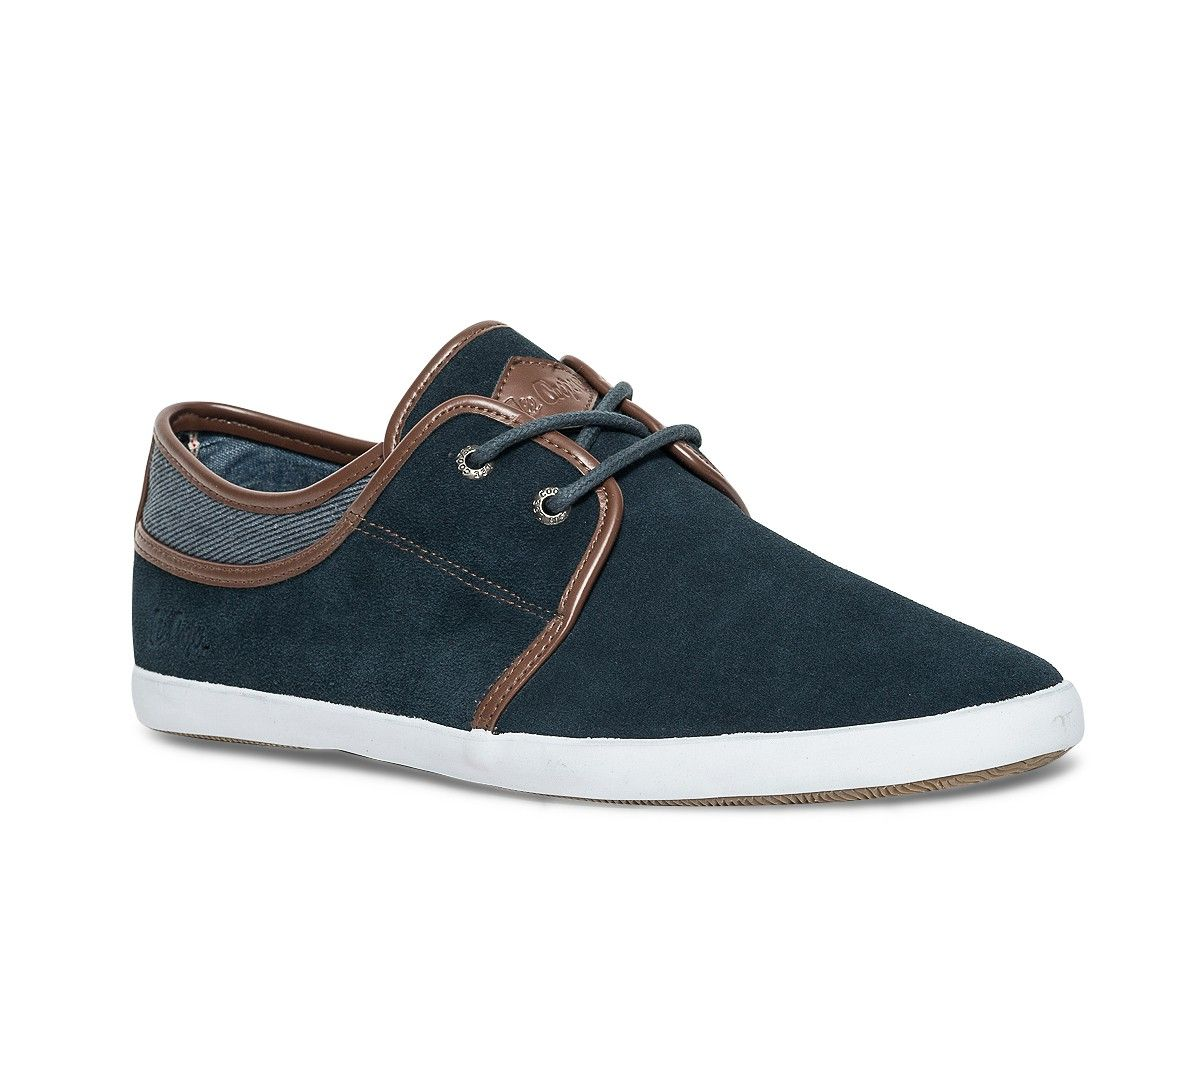 Tennis Lee Cooper cuir bleue Baskets Tennis Chaussures